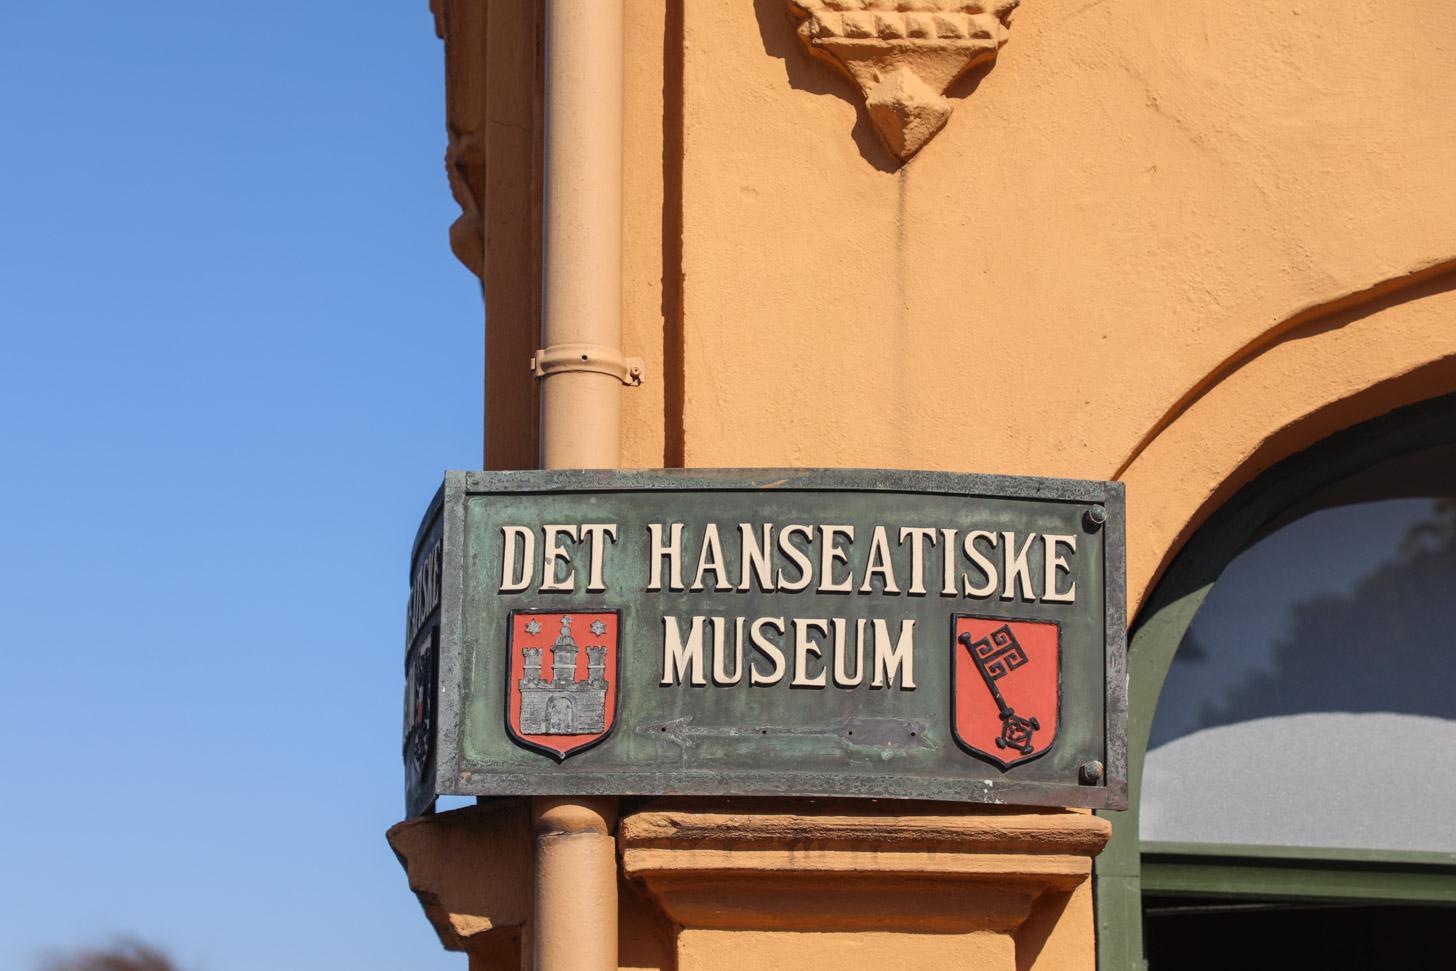 Hanseatiske Museum